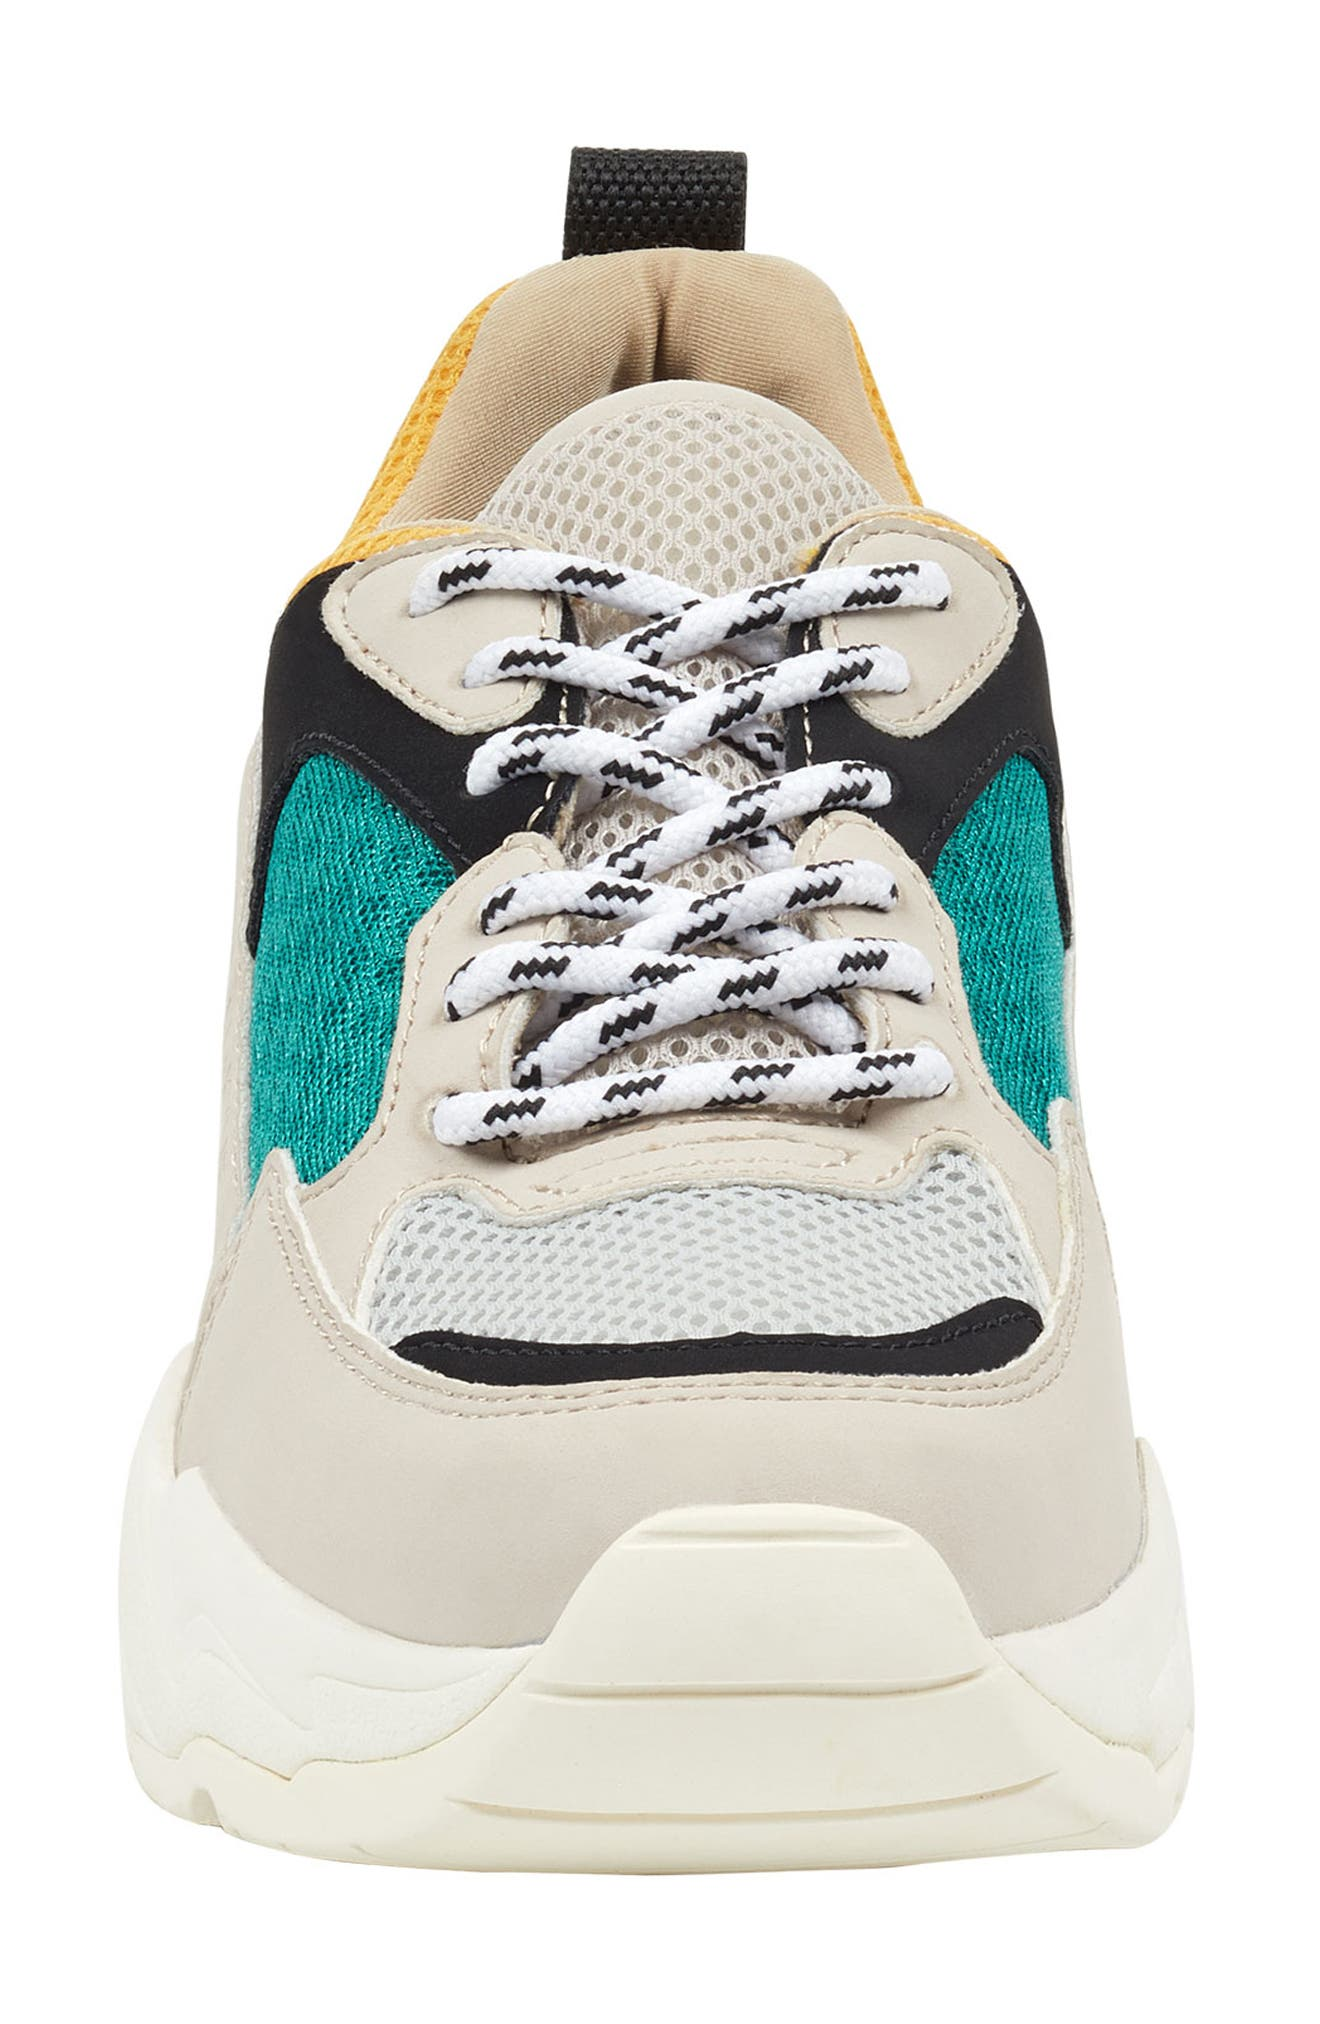 KENDALL + KYLIE,                             Dad Sneaker,                             Alternate thumbnail 4, color,                             250